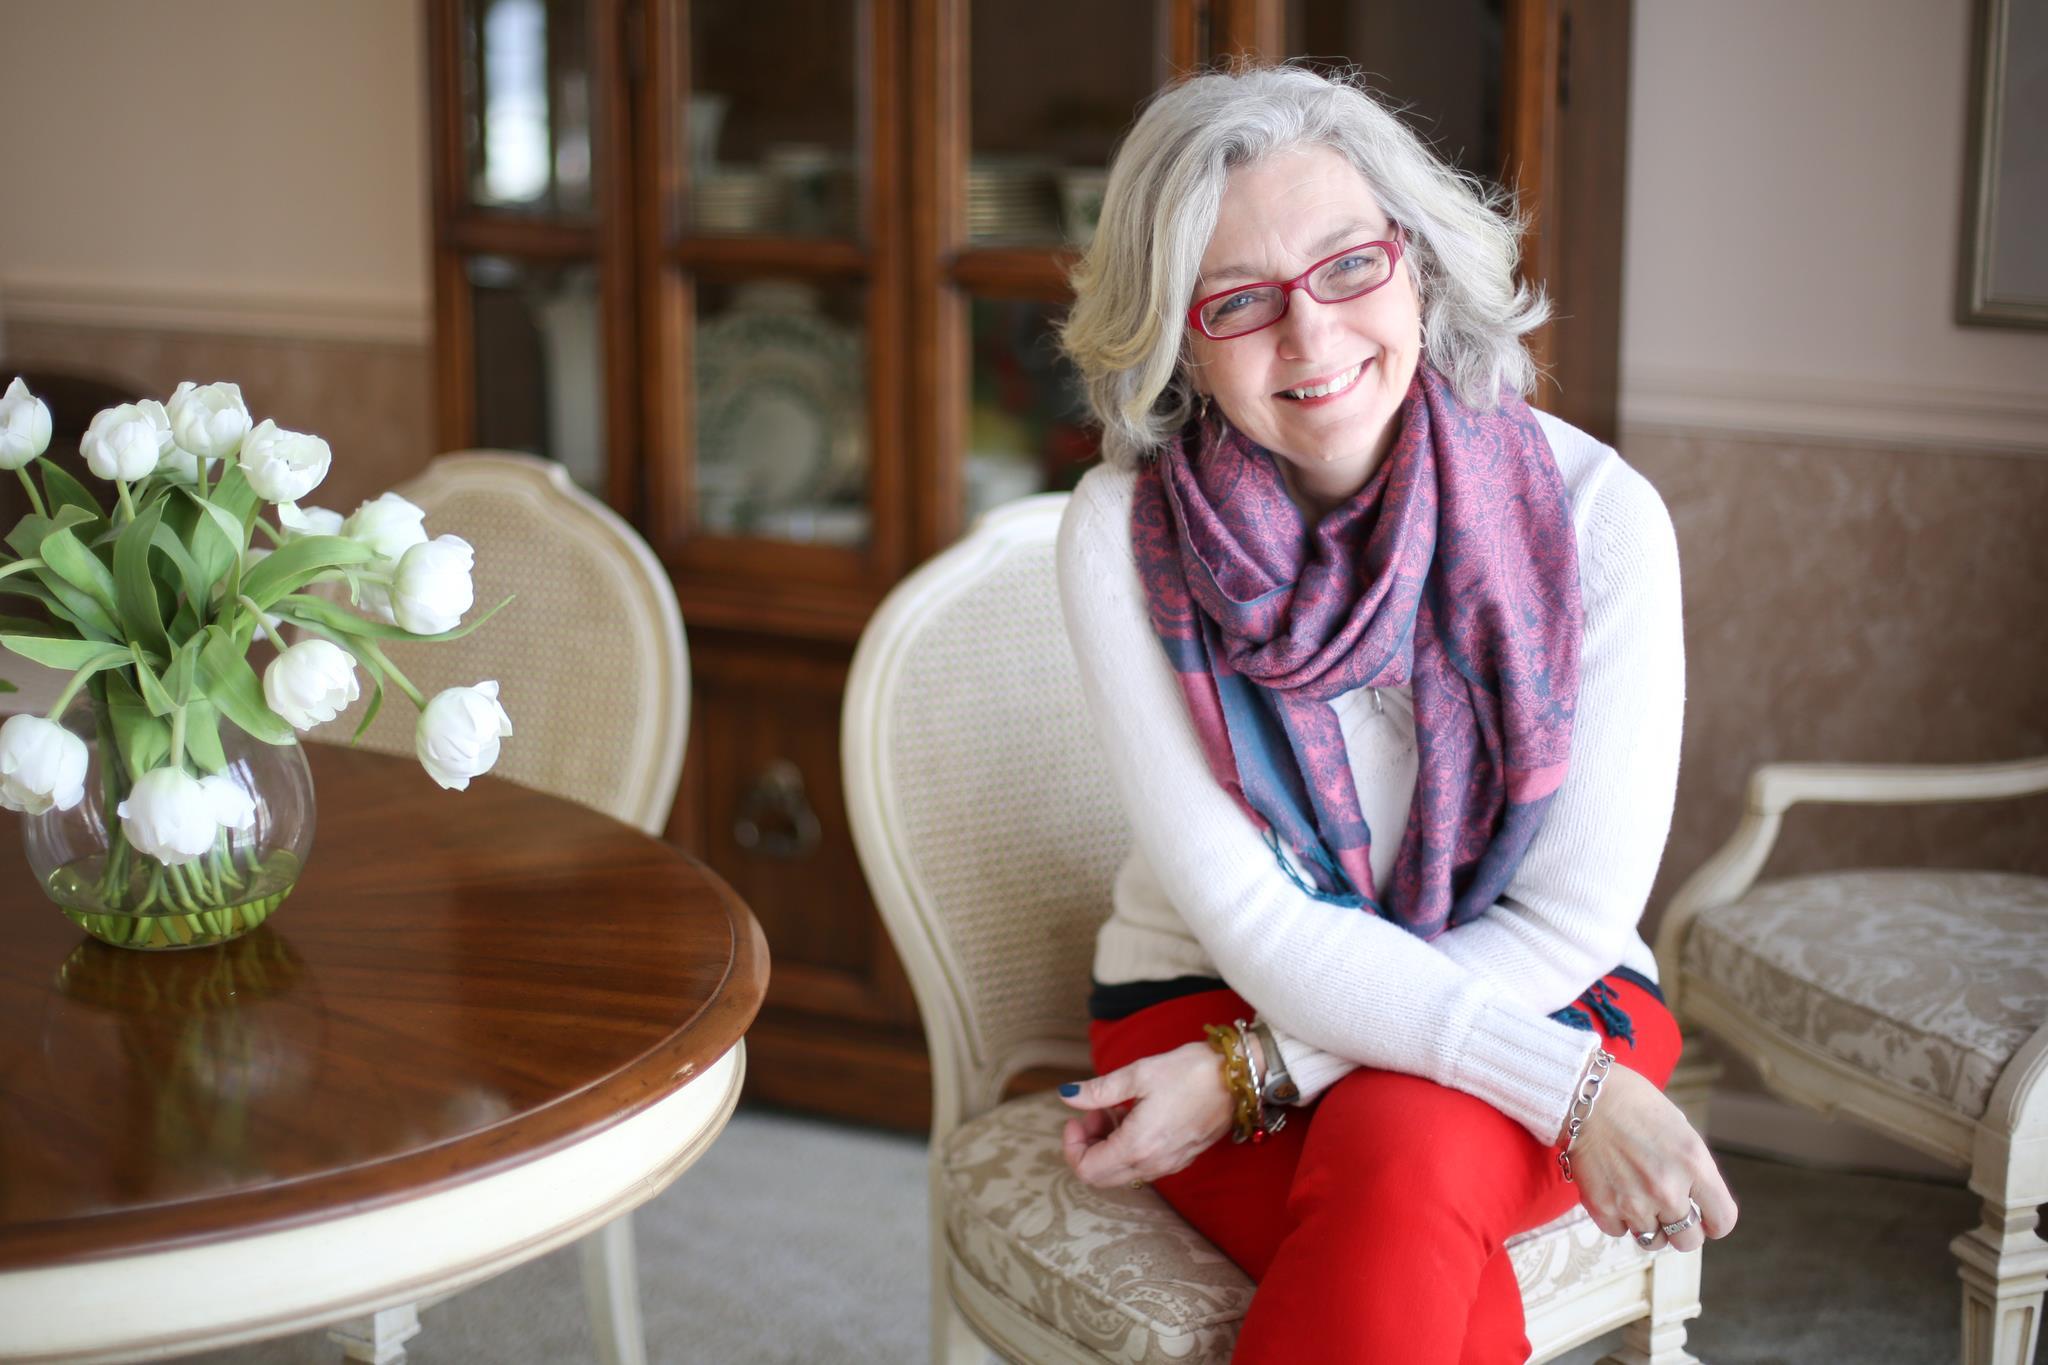 Linda Monte, owner of Katherine Patricia